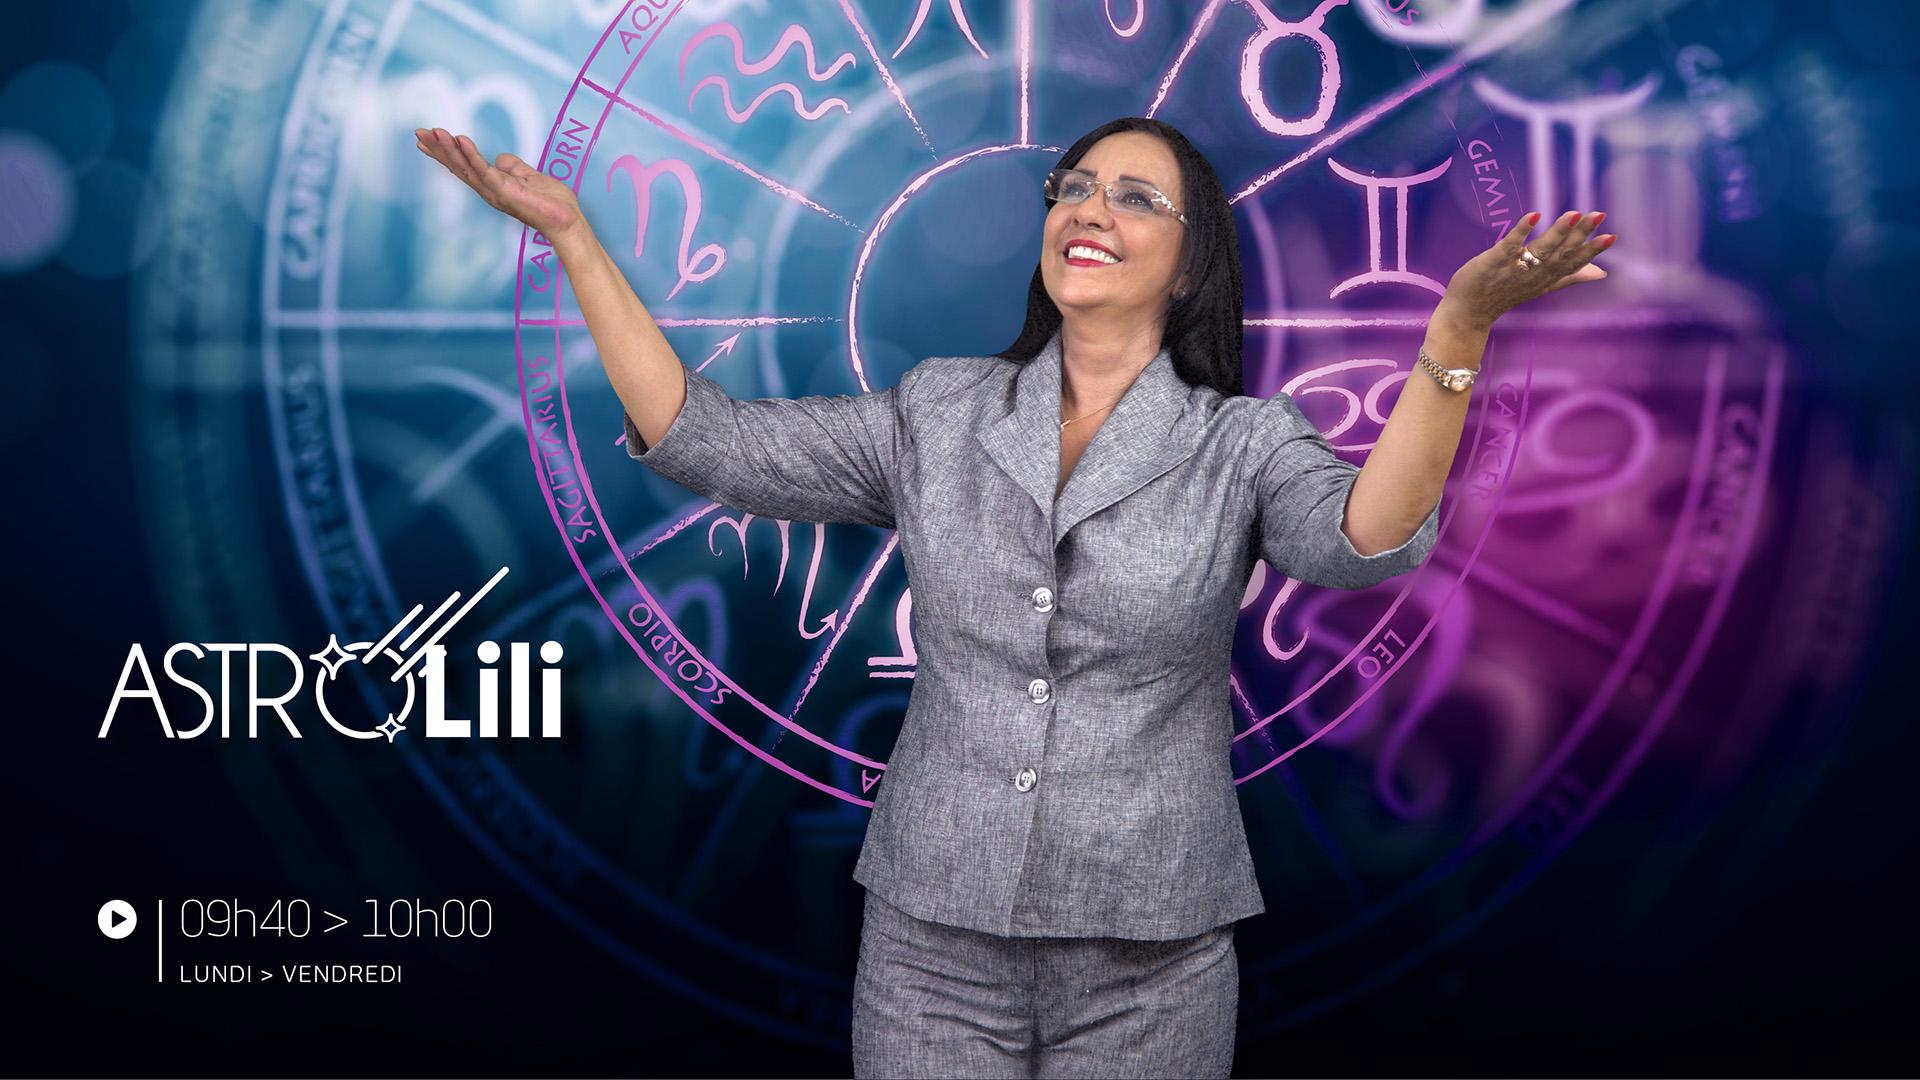 Astro Lili Vendredi 26 Juin 2020